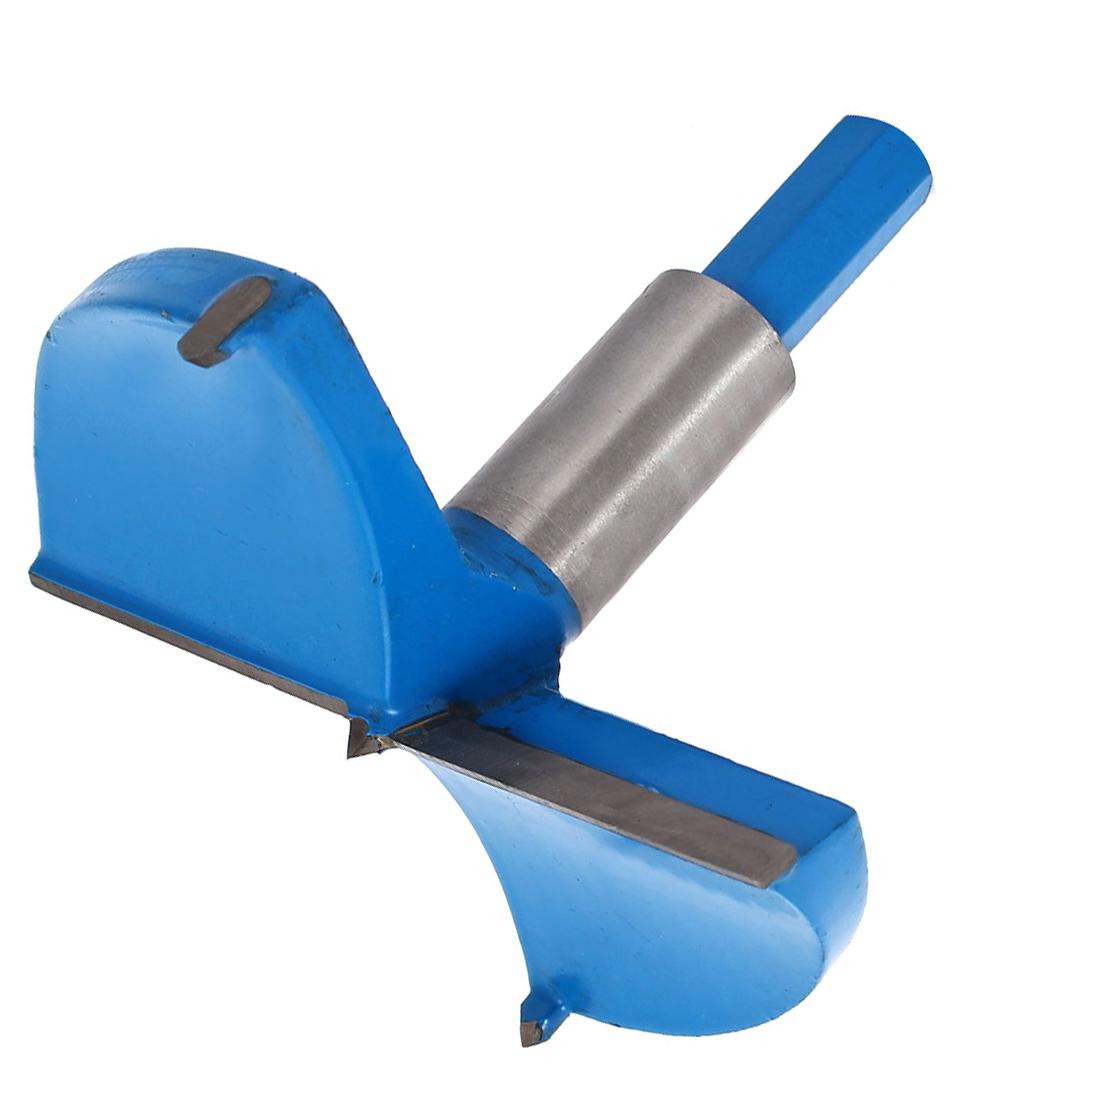 Wood Carpenter Hinge Boring Drill Bit 95mm Cutting Diameter Blue Silver Tone